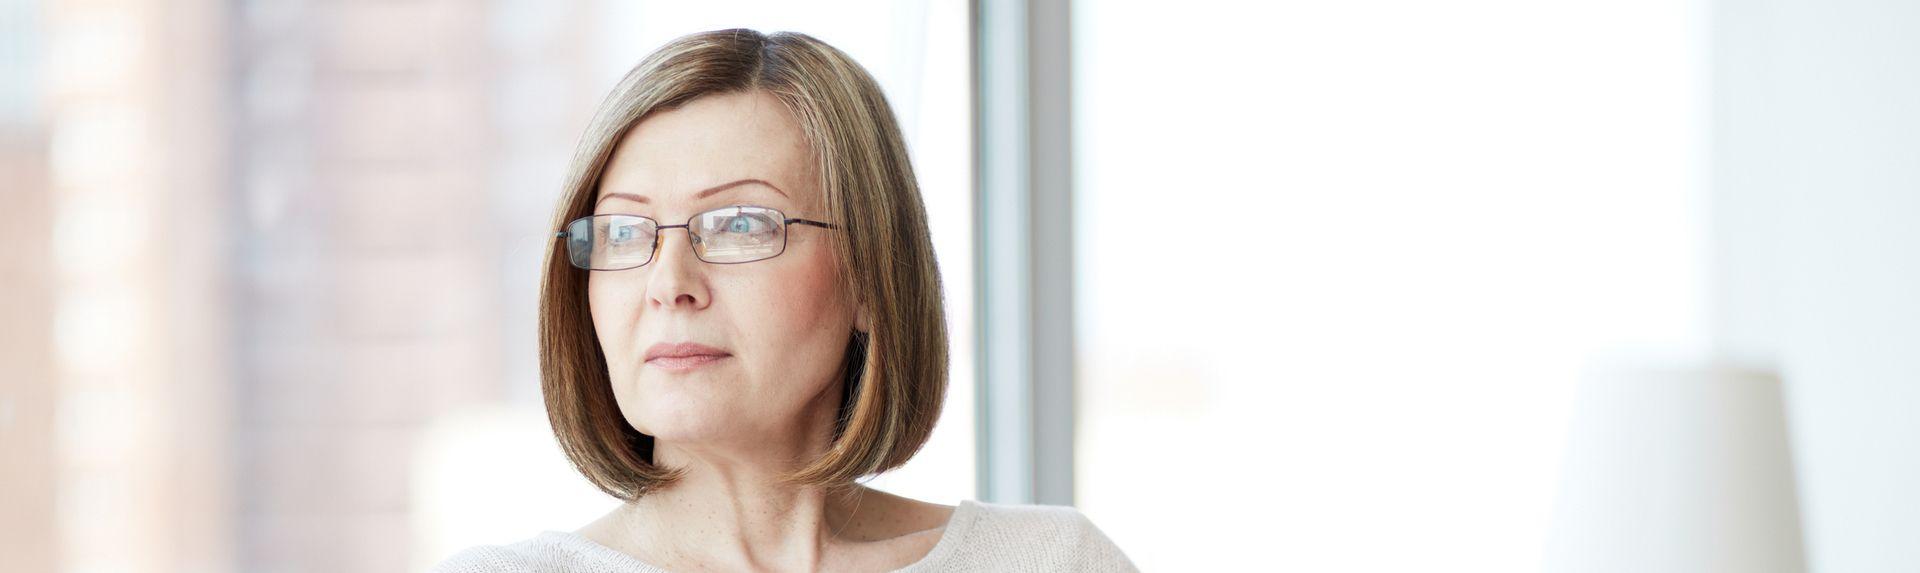 Уровень тестостерона при менопаузе